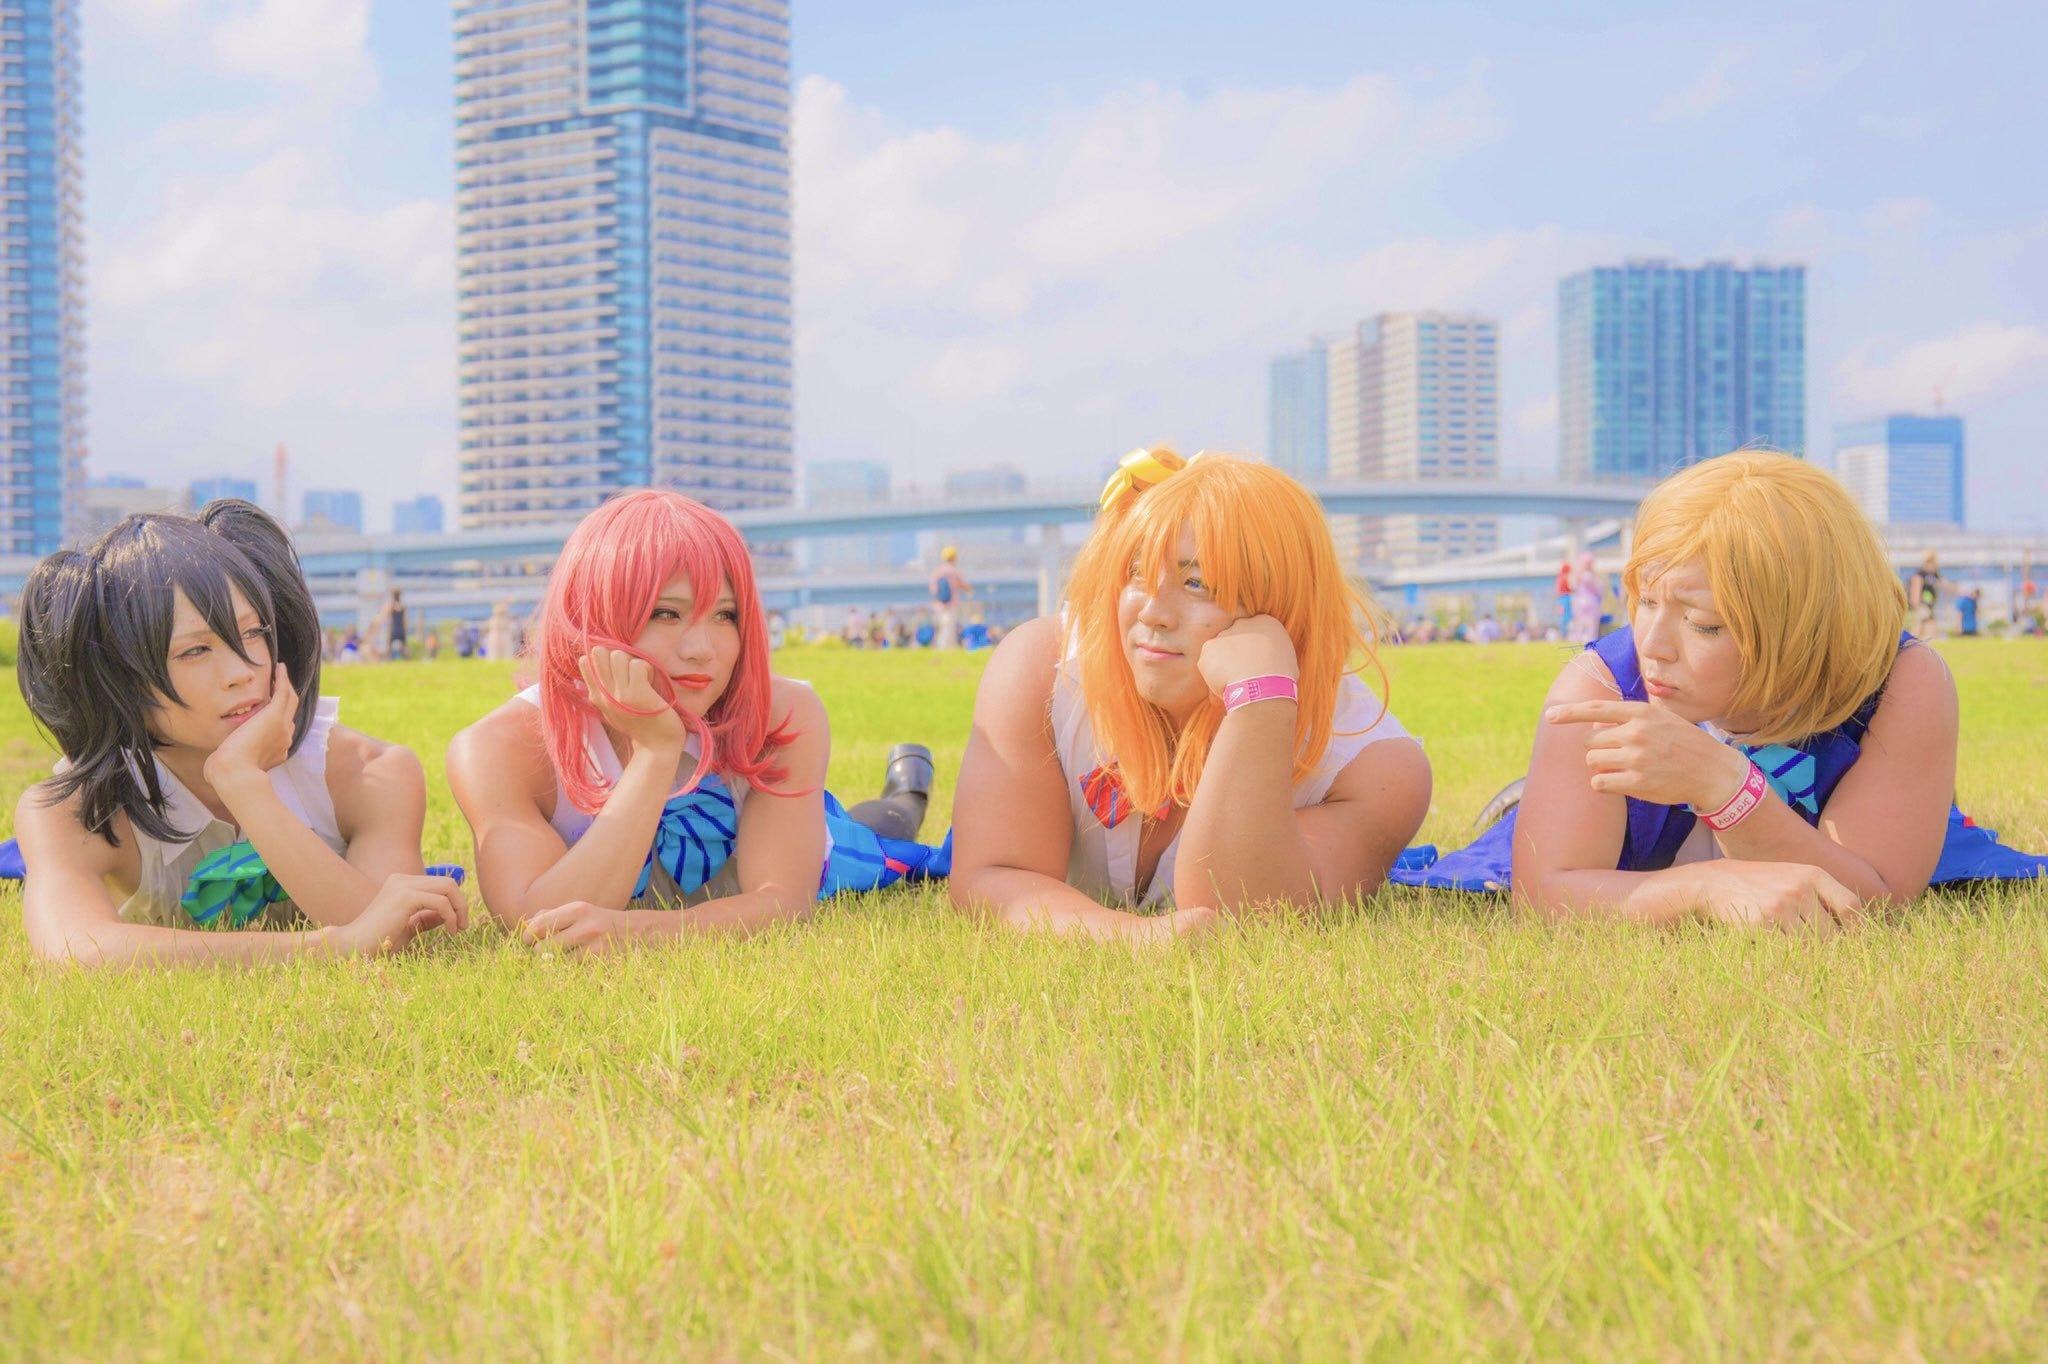 【COSPLAY】C96有趣Cosplay作品集(3)欢乐时光开始了!- ACG17.COM